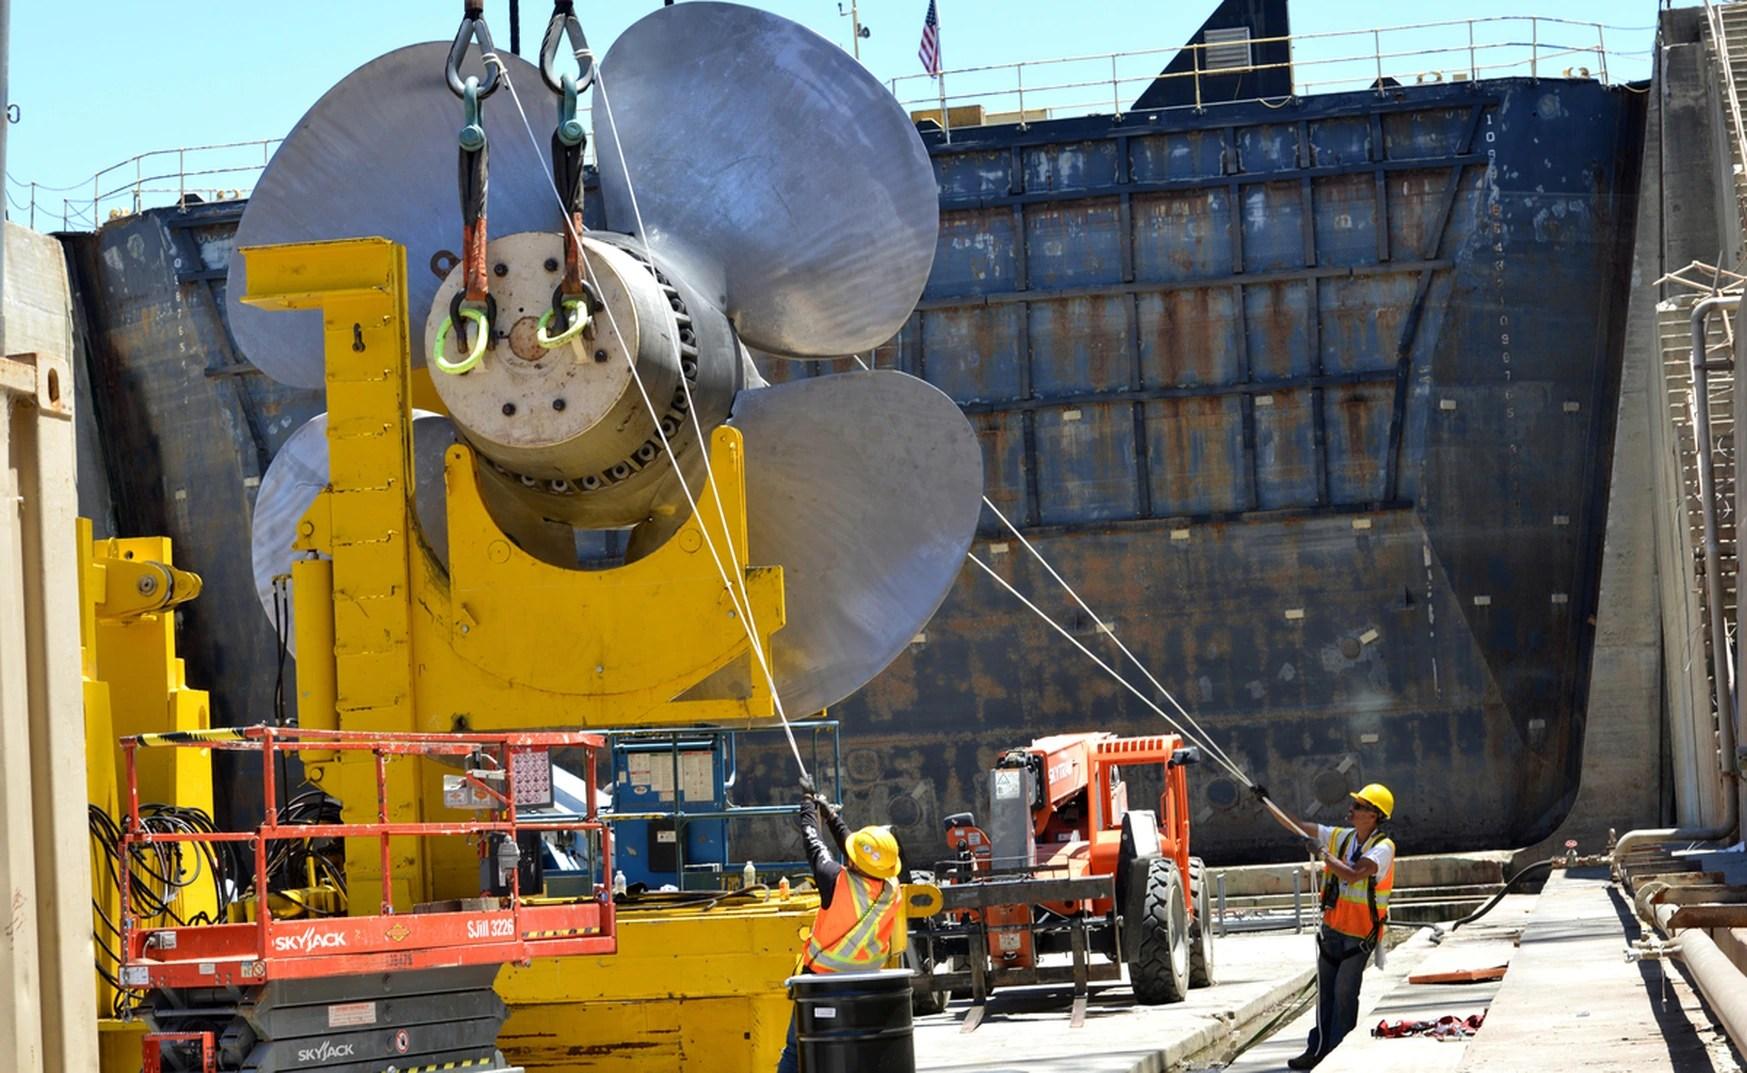 Contractors prepare to replace the 16-foot-diameter propellers on the Coast Guard cutter Polar Star. (Petty Officer 1st Class Matthew S. Masaschi/U.S. Coast Guard)